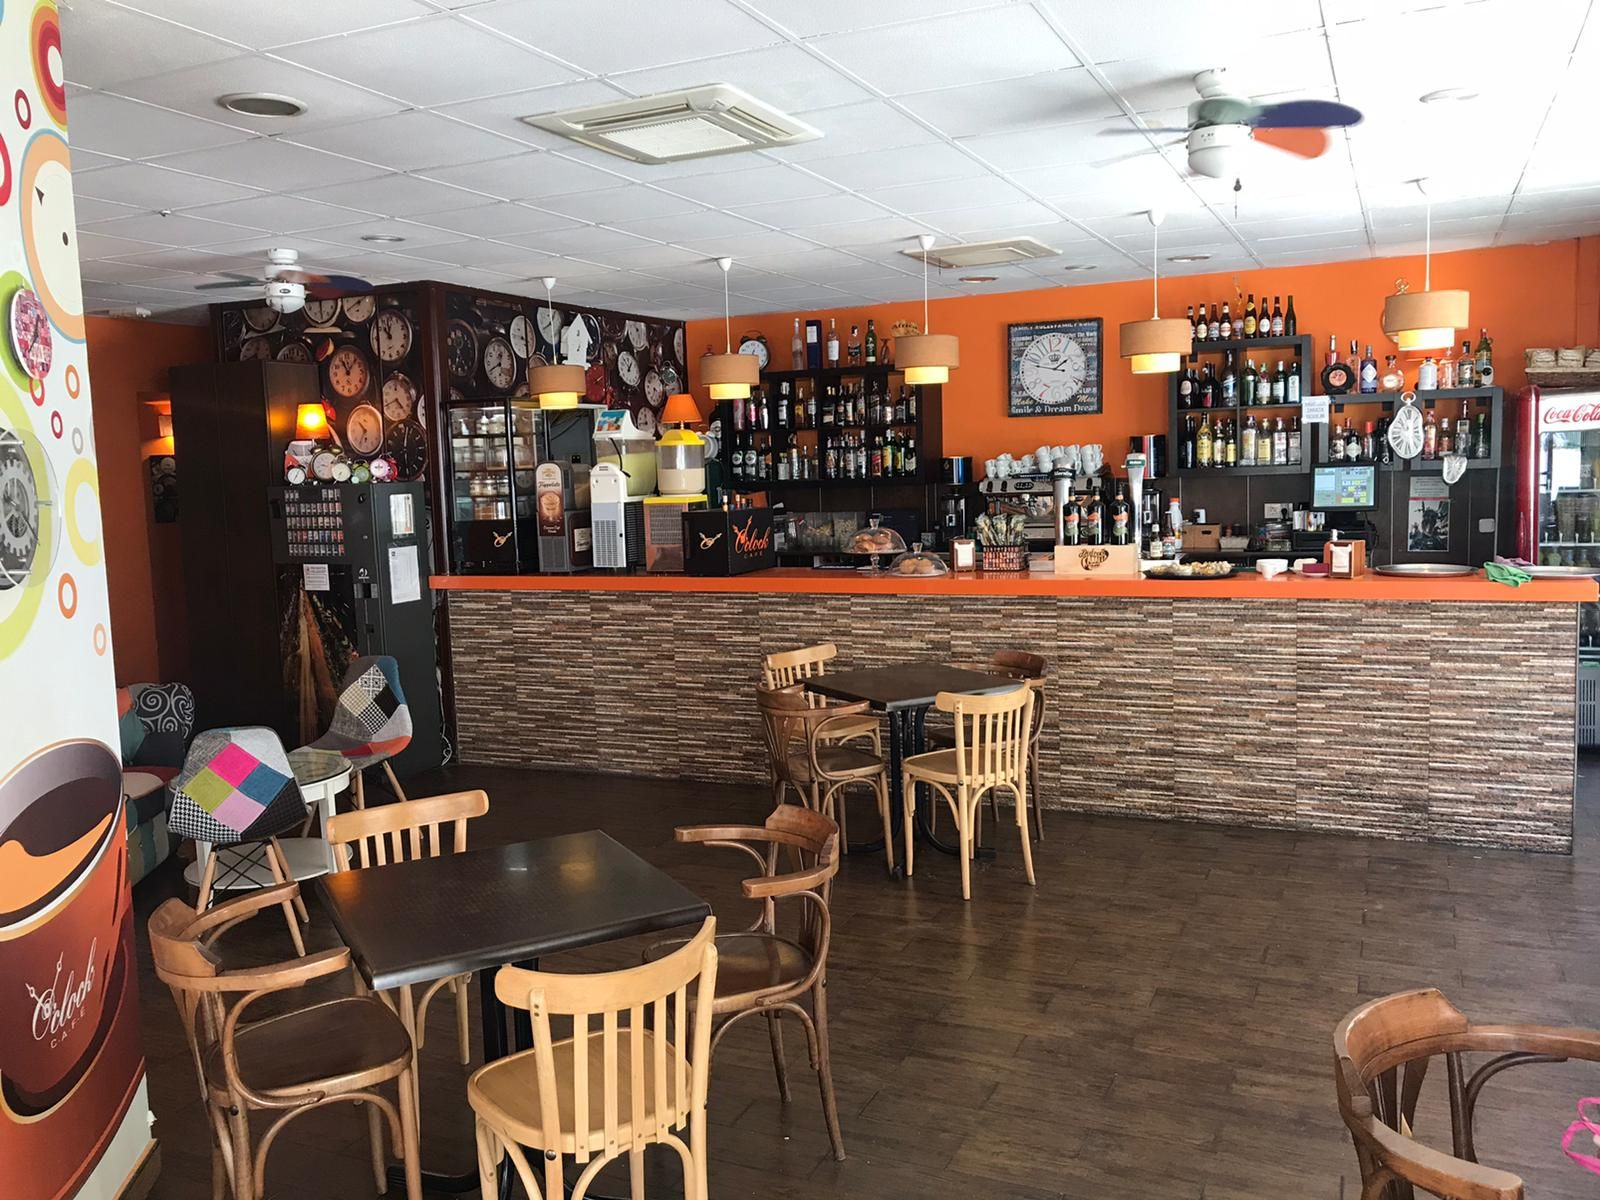 Foto 5 de Restaurante en Valencia | Cafetería Tosteria O´Clock